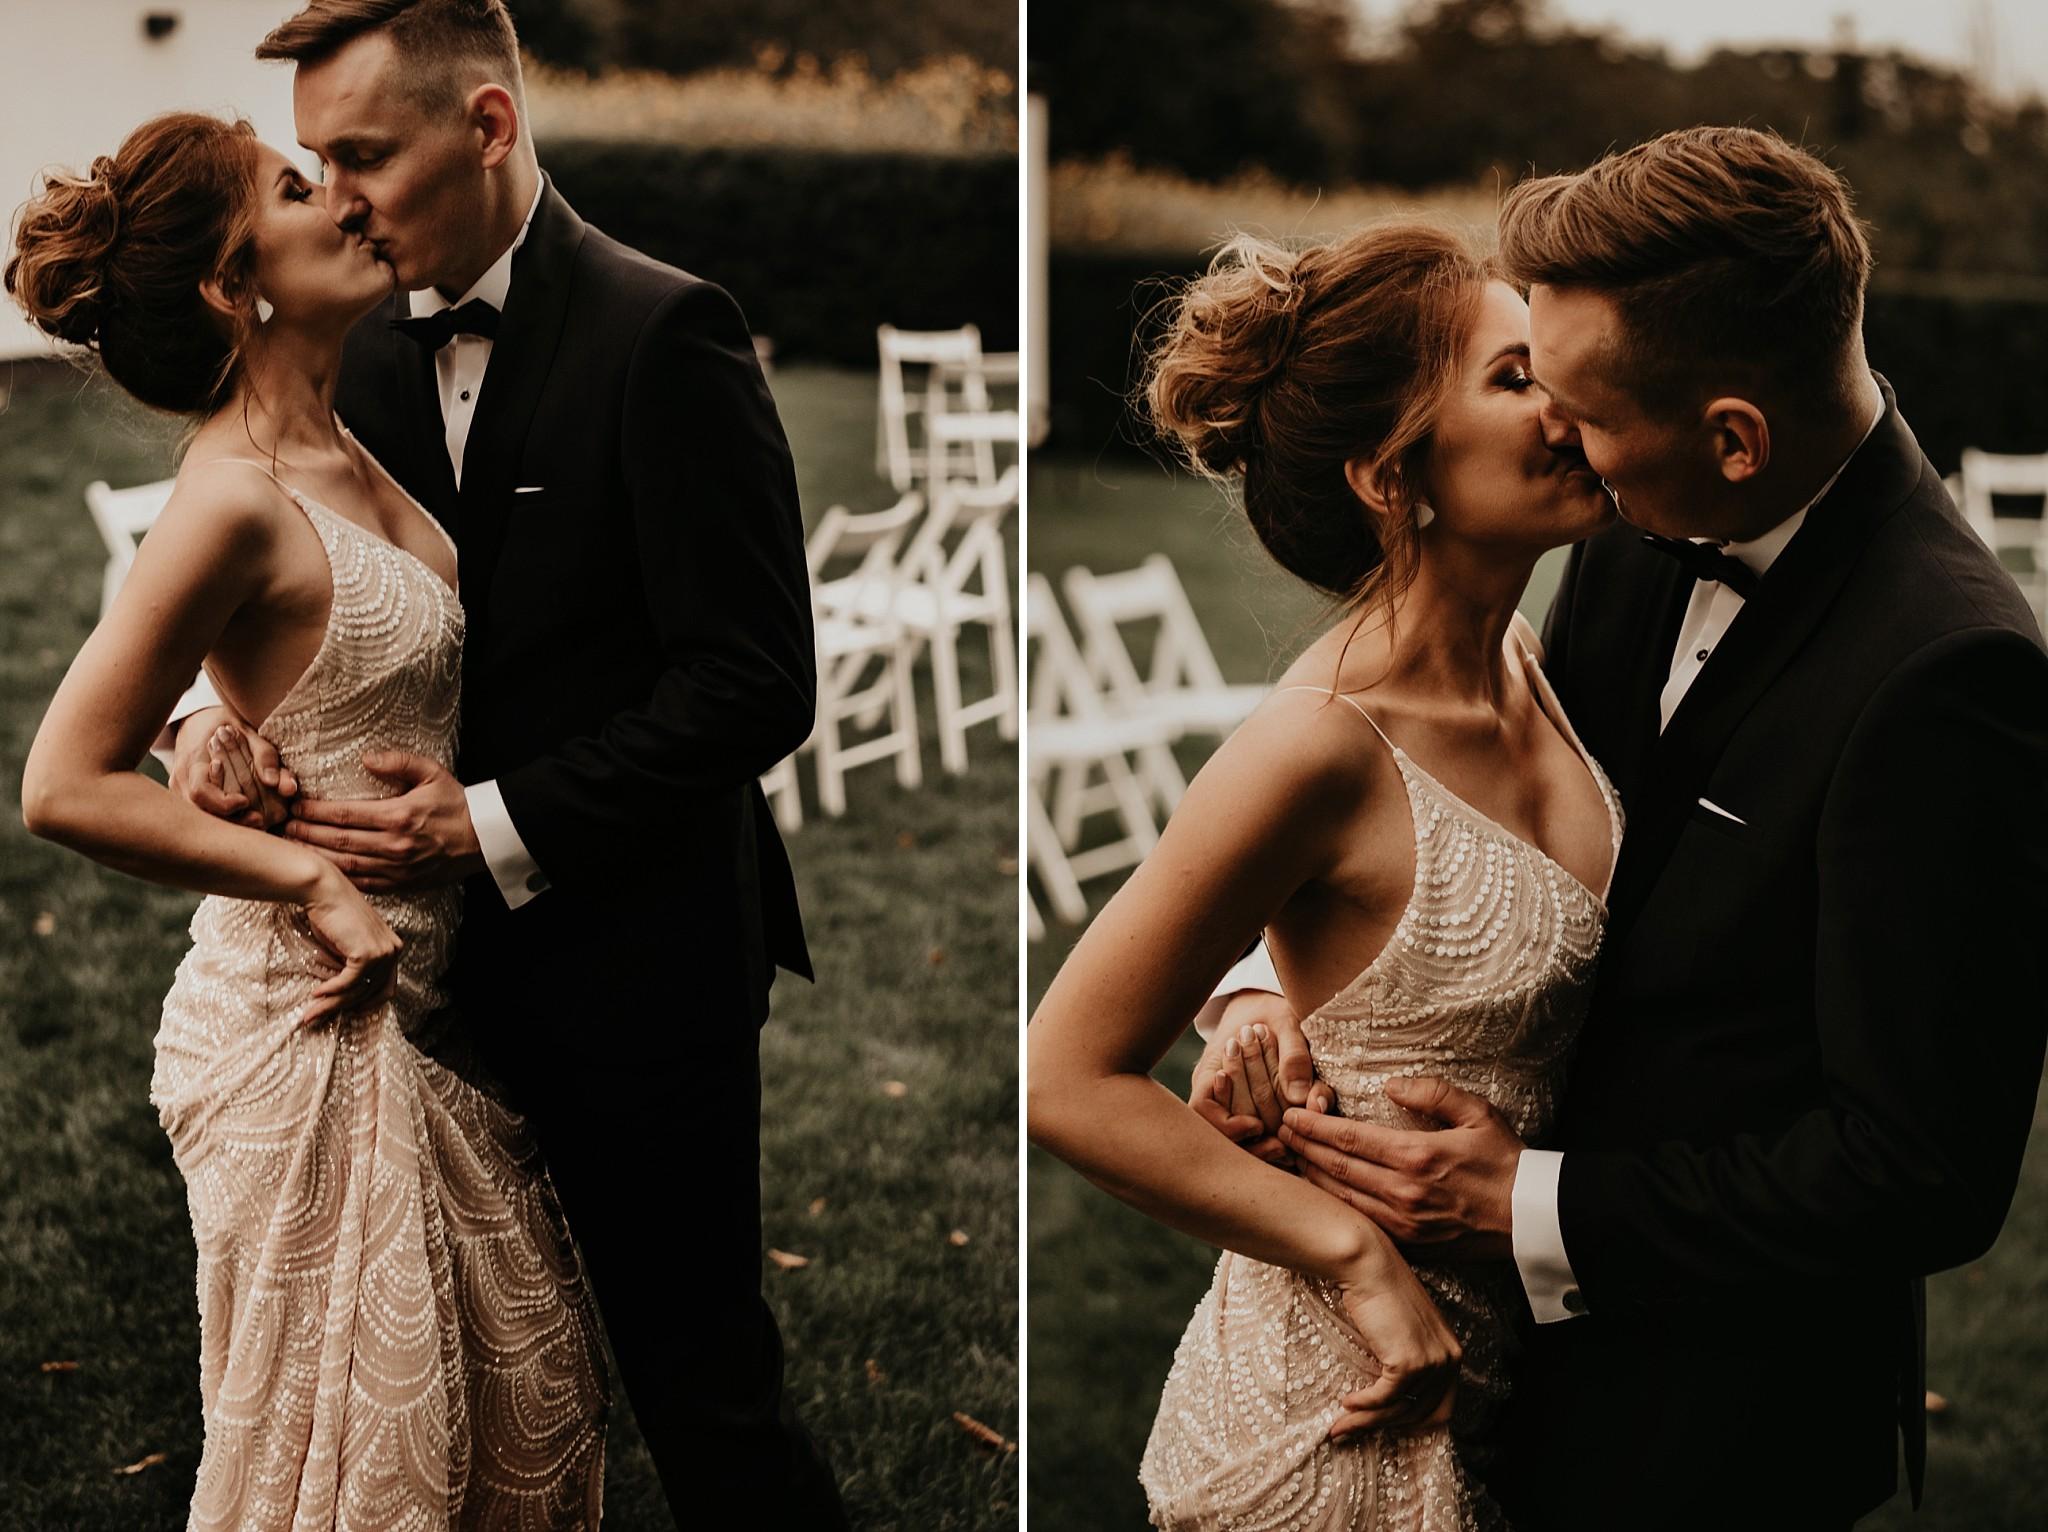 fotograf poznan wesele dobra truskawka piekne wesele pod poznaniem wesele w dobrej truskawce piekna para mloda slub marzen slub koronawirus slub listopad wesele koronawirus 370